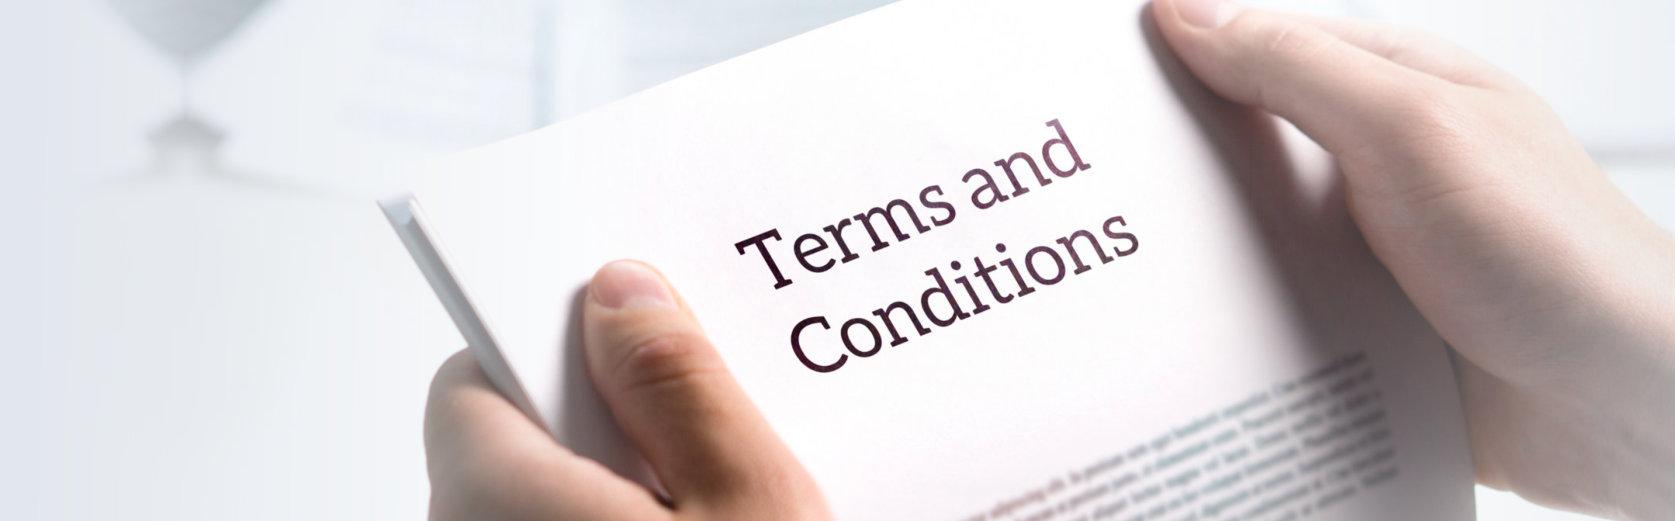 website-legal-requirements